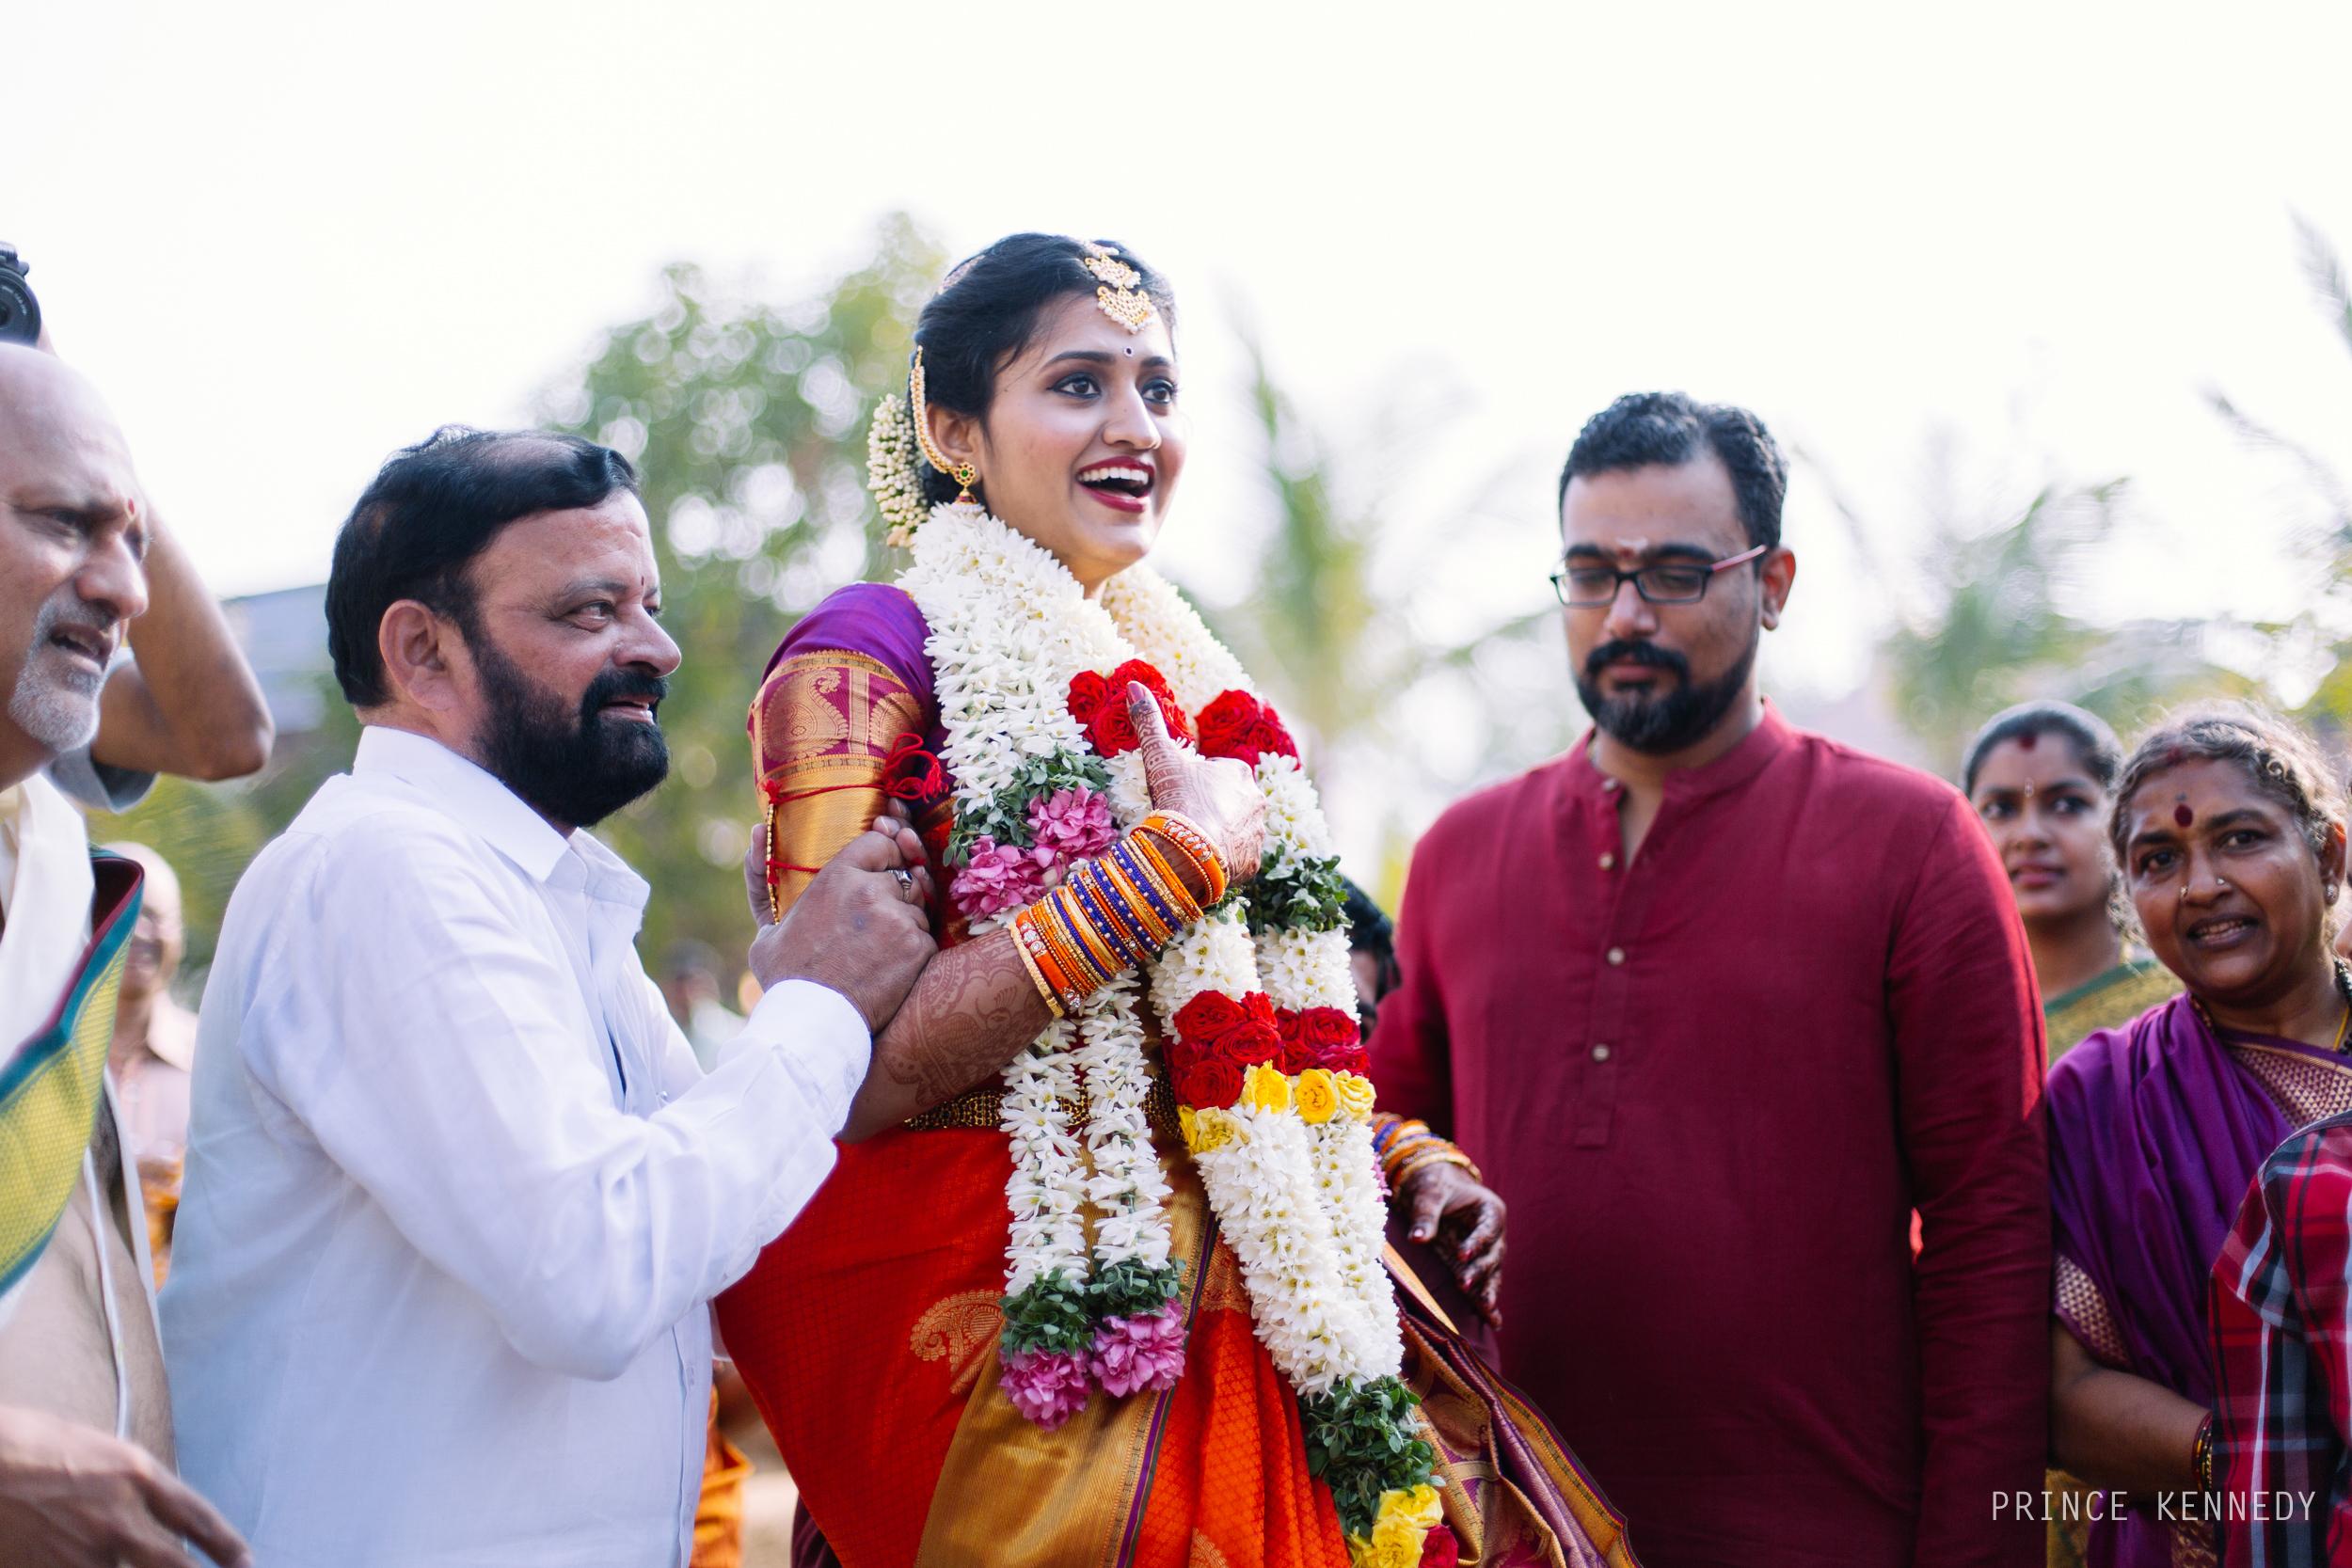 Athmajja-Nithesh-Engagement-Couple-Portrait-Portraiture-Wedding-Couple-Portrait-Chennai-Photographer-Candid-Photography-Destination-Best-Prince-Kennedy-Photography-93.jpg